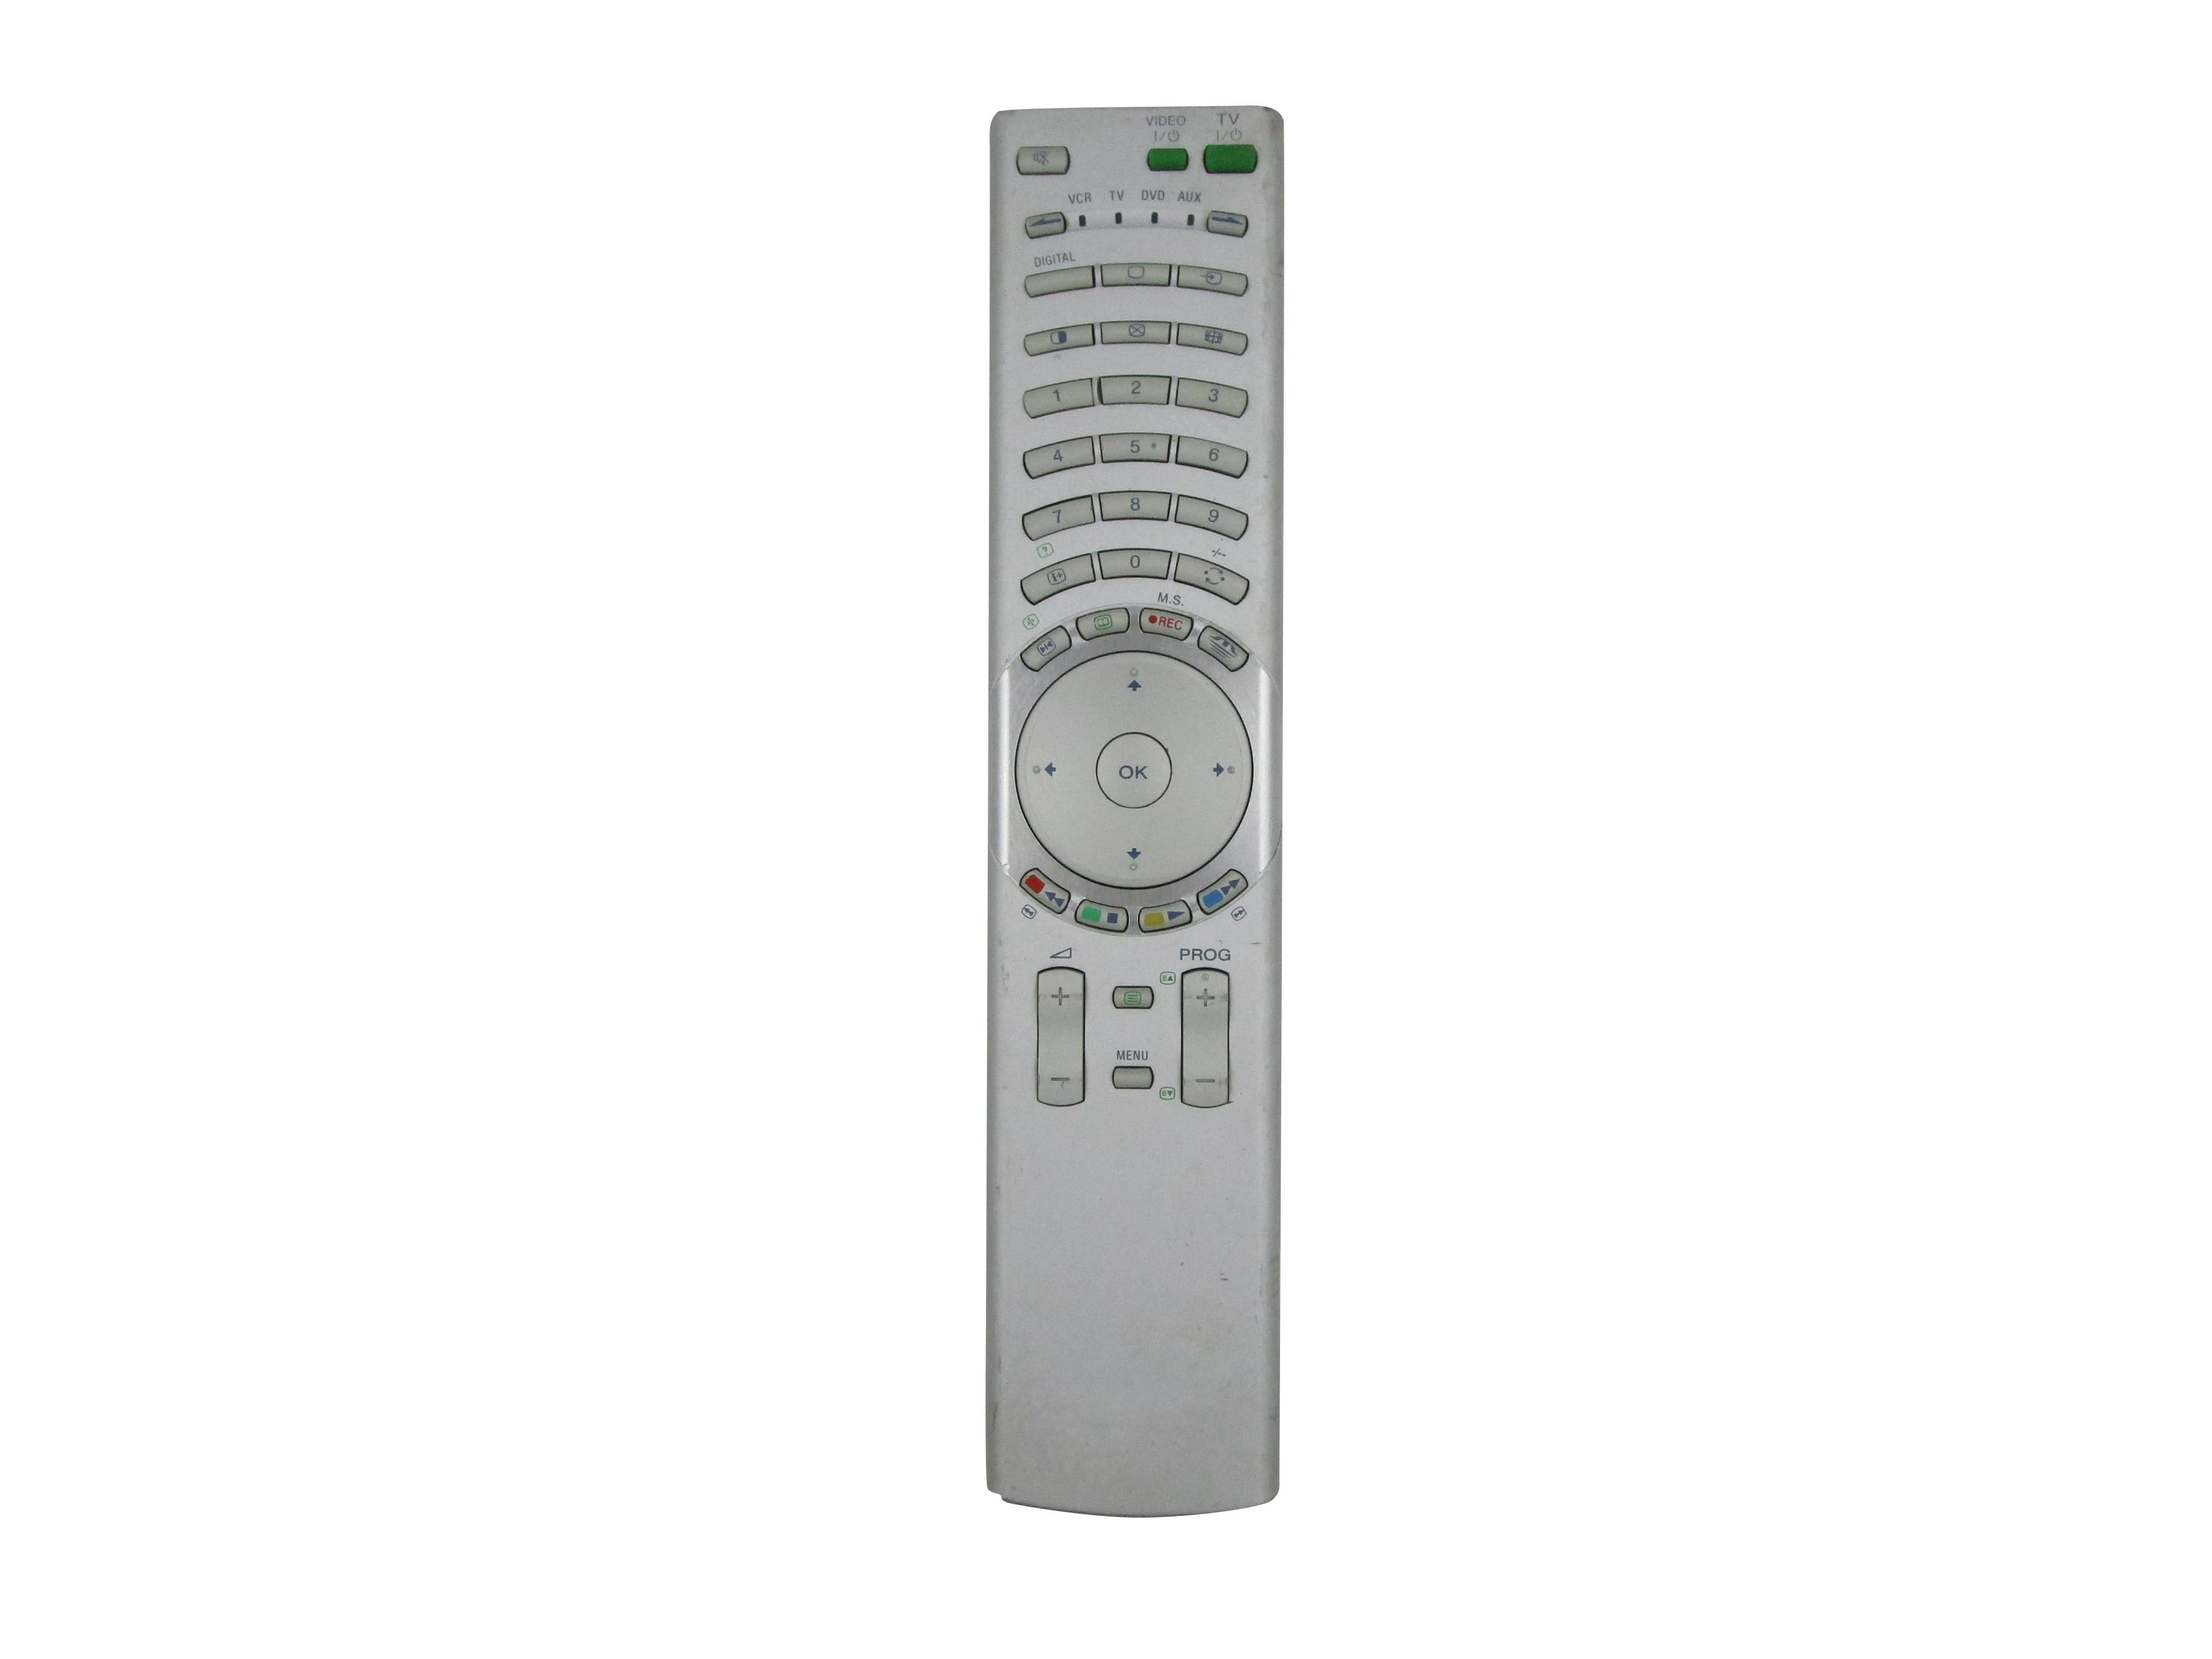 Mando a distancia para Sony KE-P61MRX1, LDM-3210, KE-P42MRX1, LDM-4210, PDM-4210, PDM-5010, MBT-MRX1, LCD, HDTV